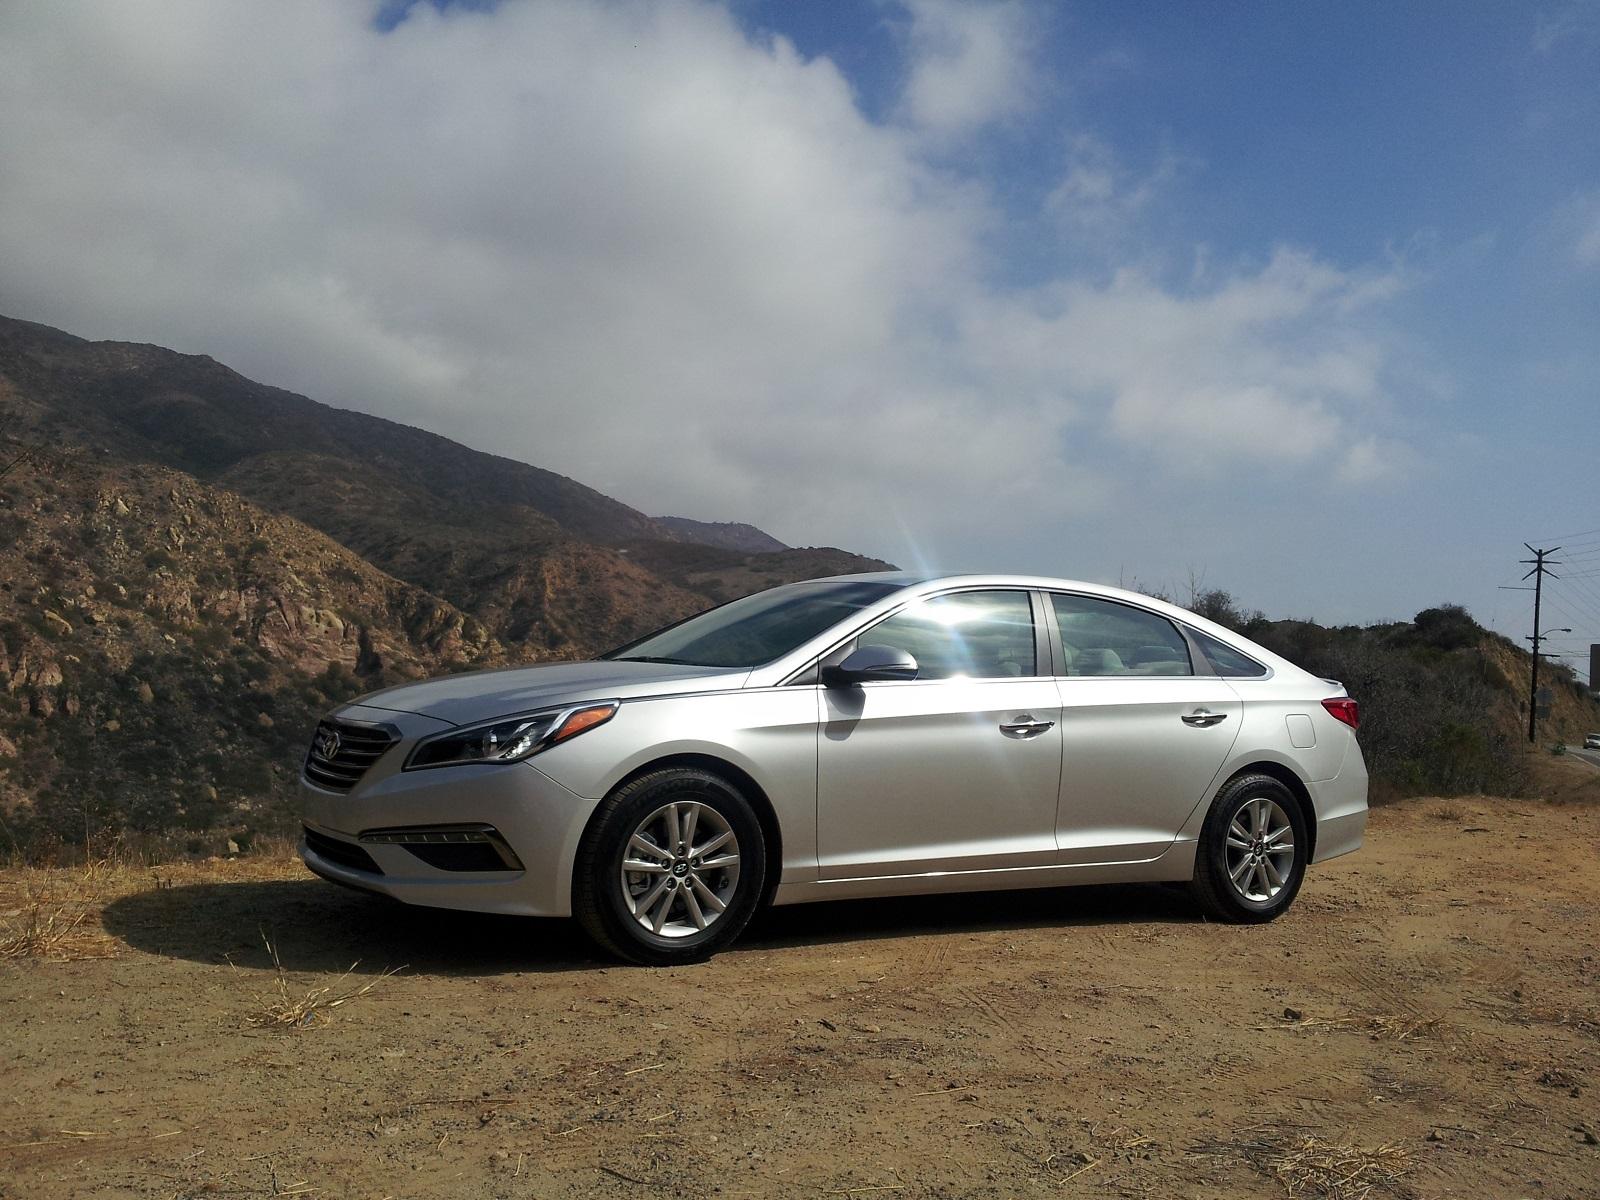 Hyundai Sonata Mpg >> 2015 Hyundai Sonata Eco Gas Mileage Review